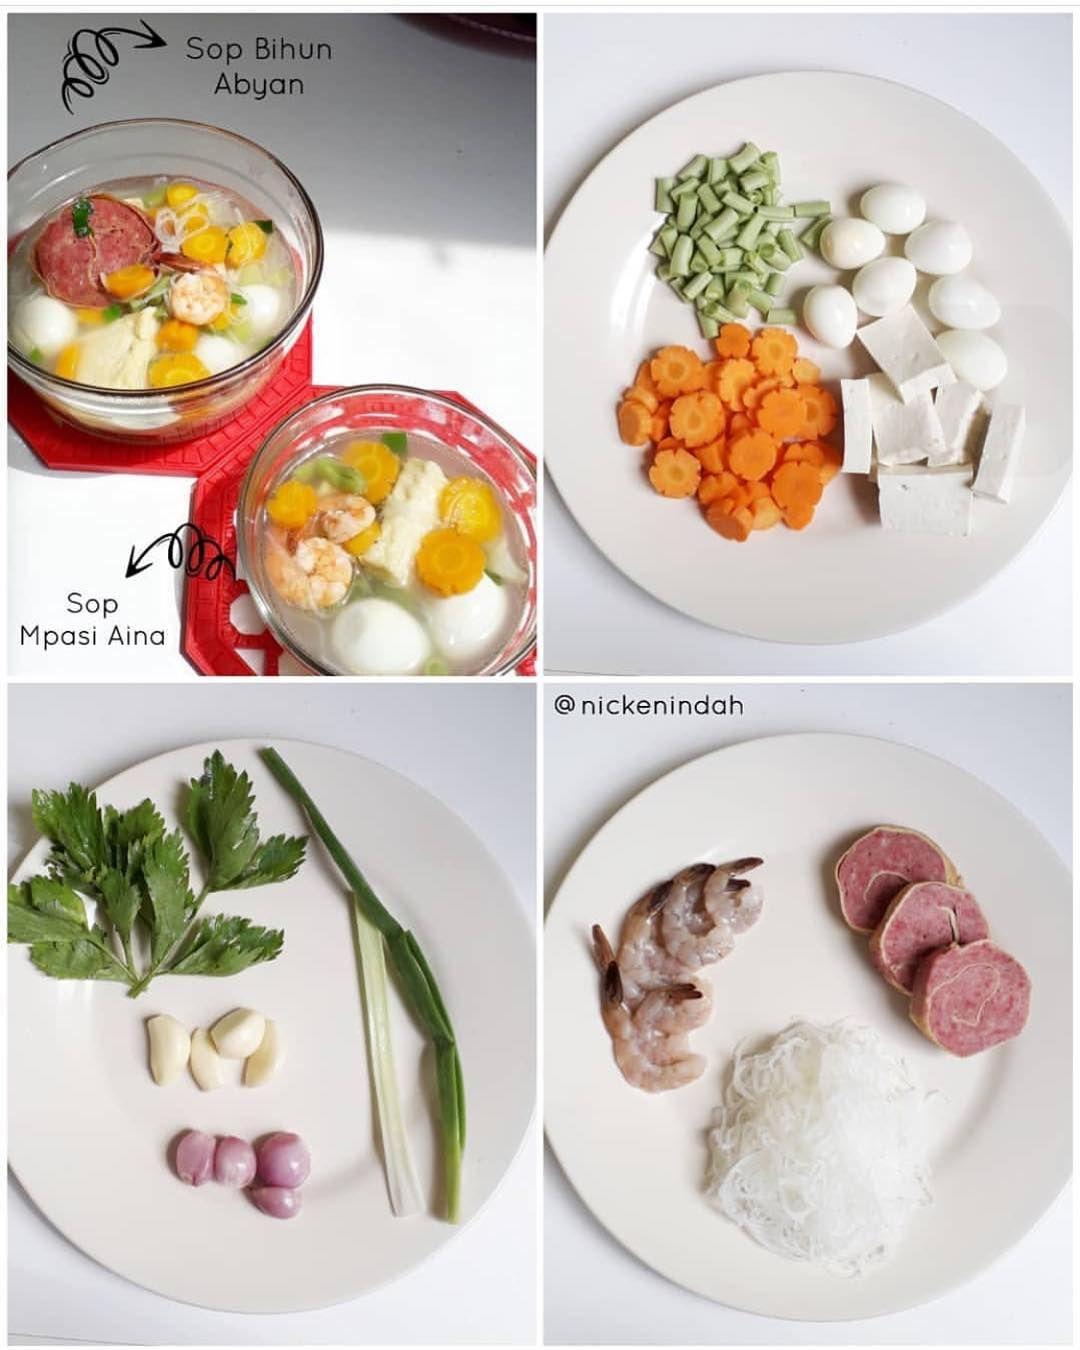 Resep By Nickenindah Menu Abyan Aina Sop Bihun Bihun Jagung Rebus Udang Telur Puyuh Rebus Rolade Daging Sapi Wortel Bunc Makanan Daging Sapi Rebusan